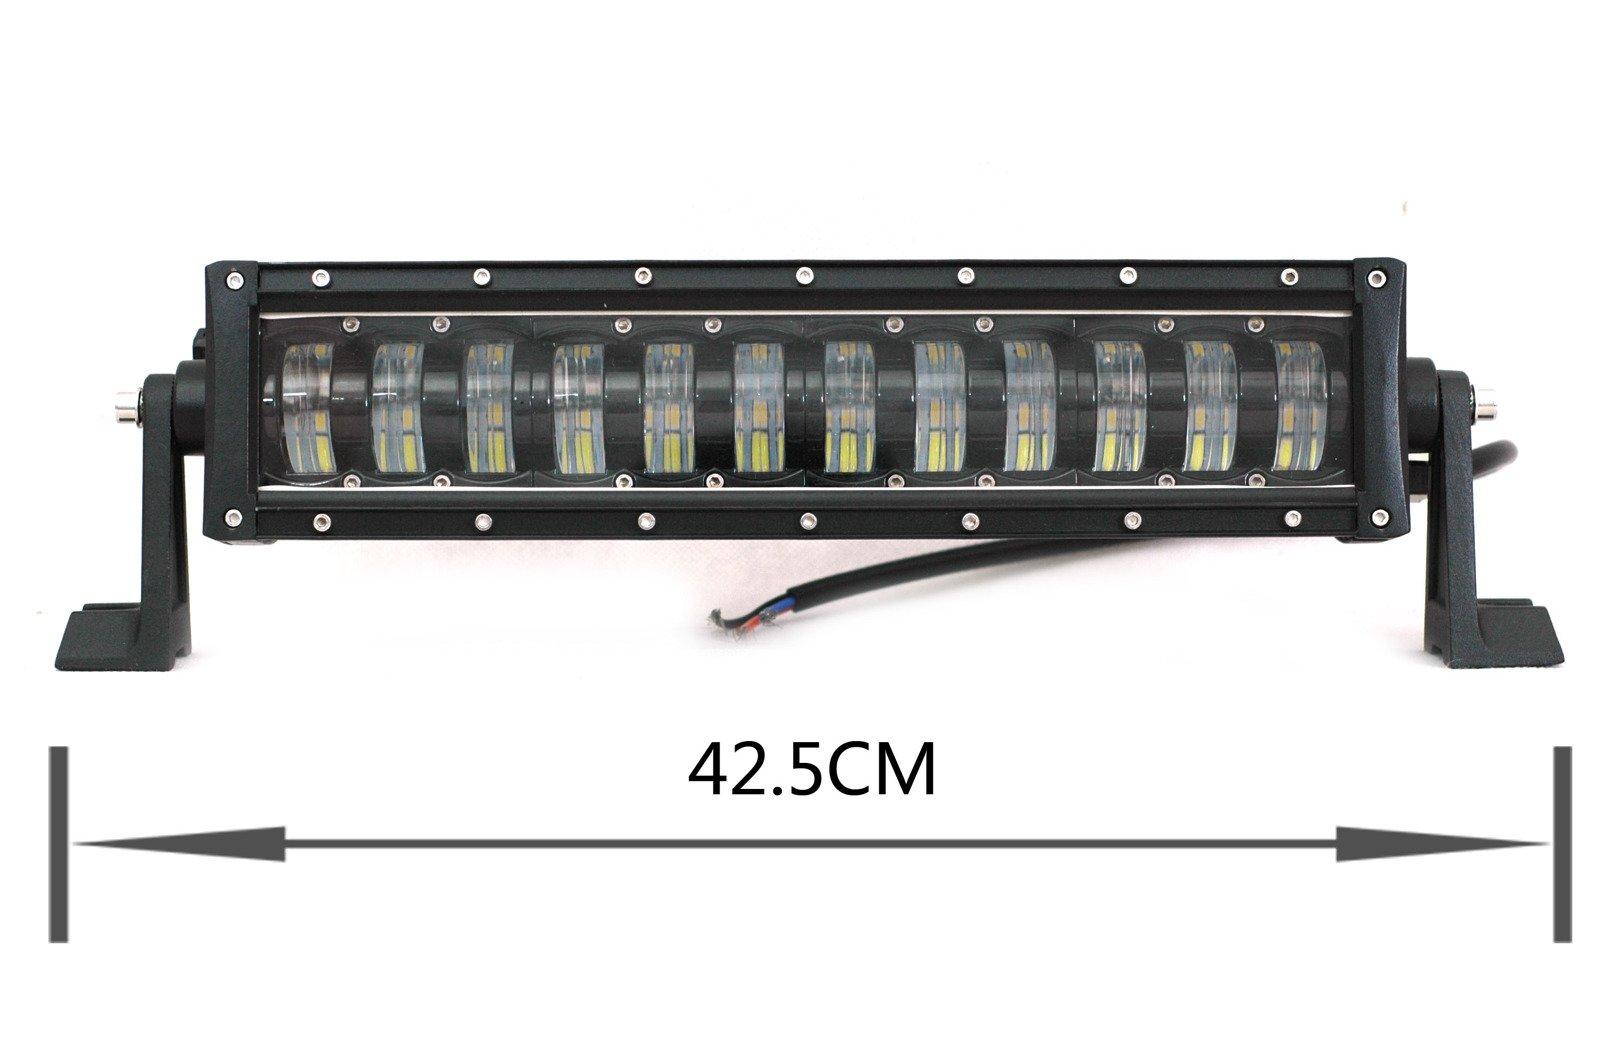 led work light bar 4x4 off road atv truck quad flood lamp 16 7 96w cree led lb j 96w drl. Black Bedroom Furniture Sets. Home Design Ideas